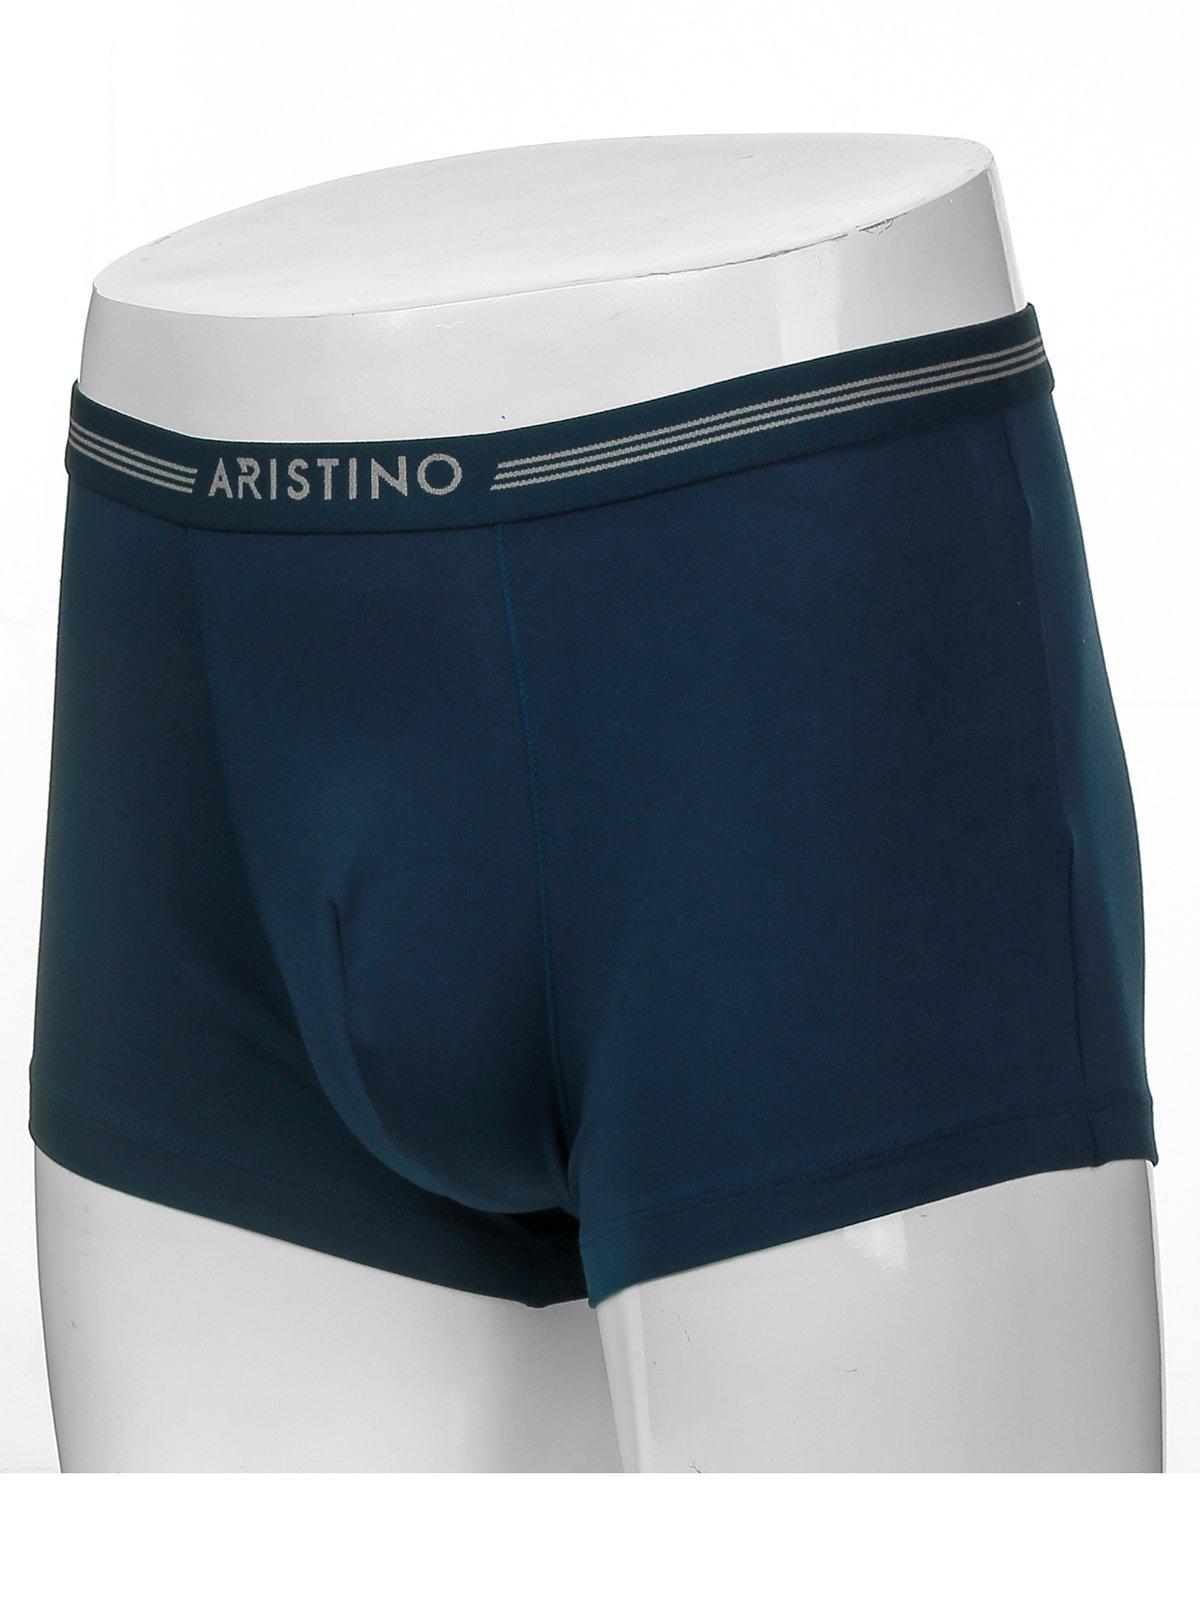 Quần lót nam Aristino ABX03807